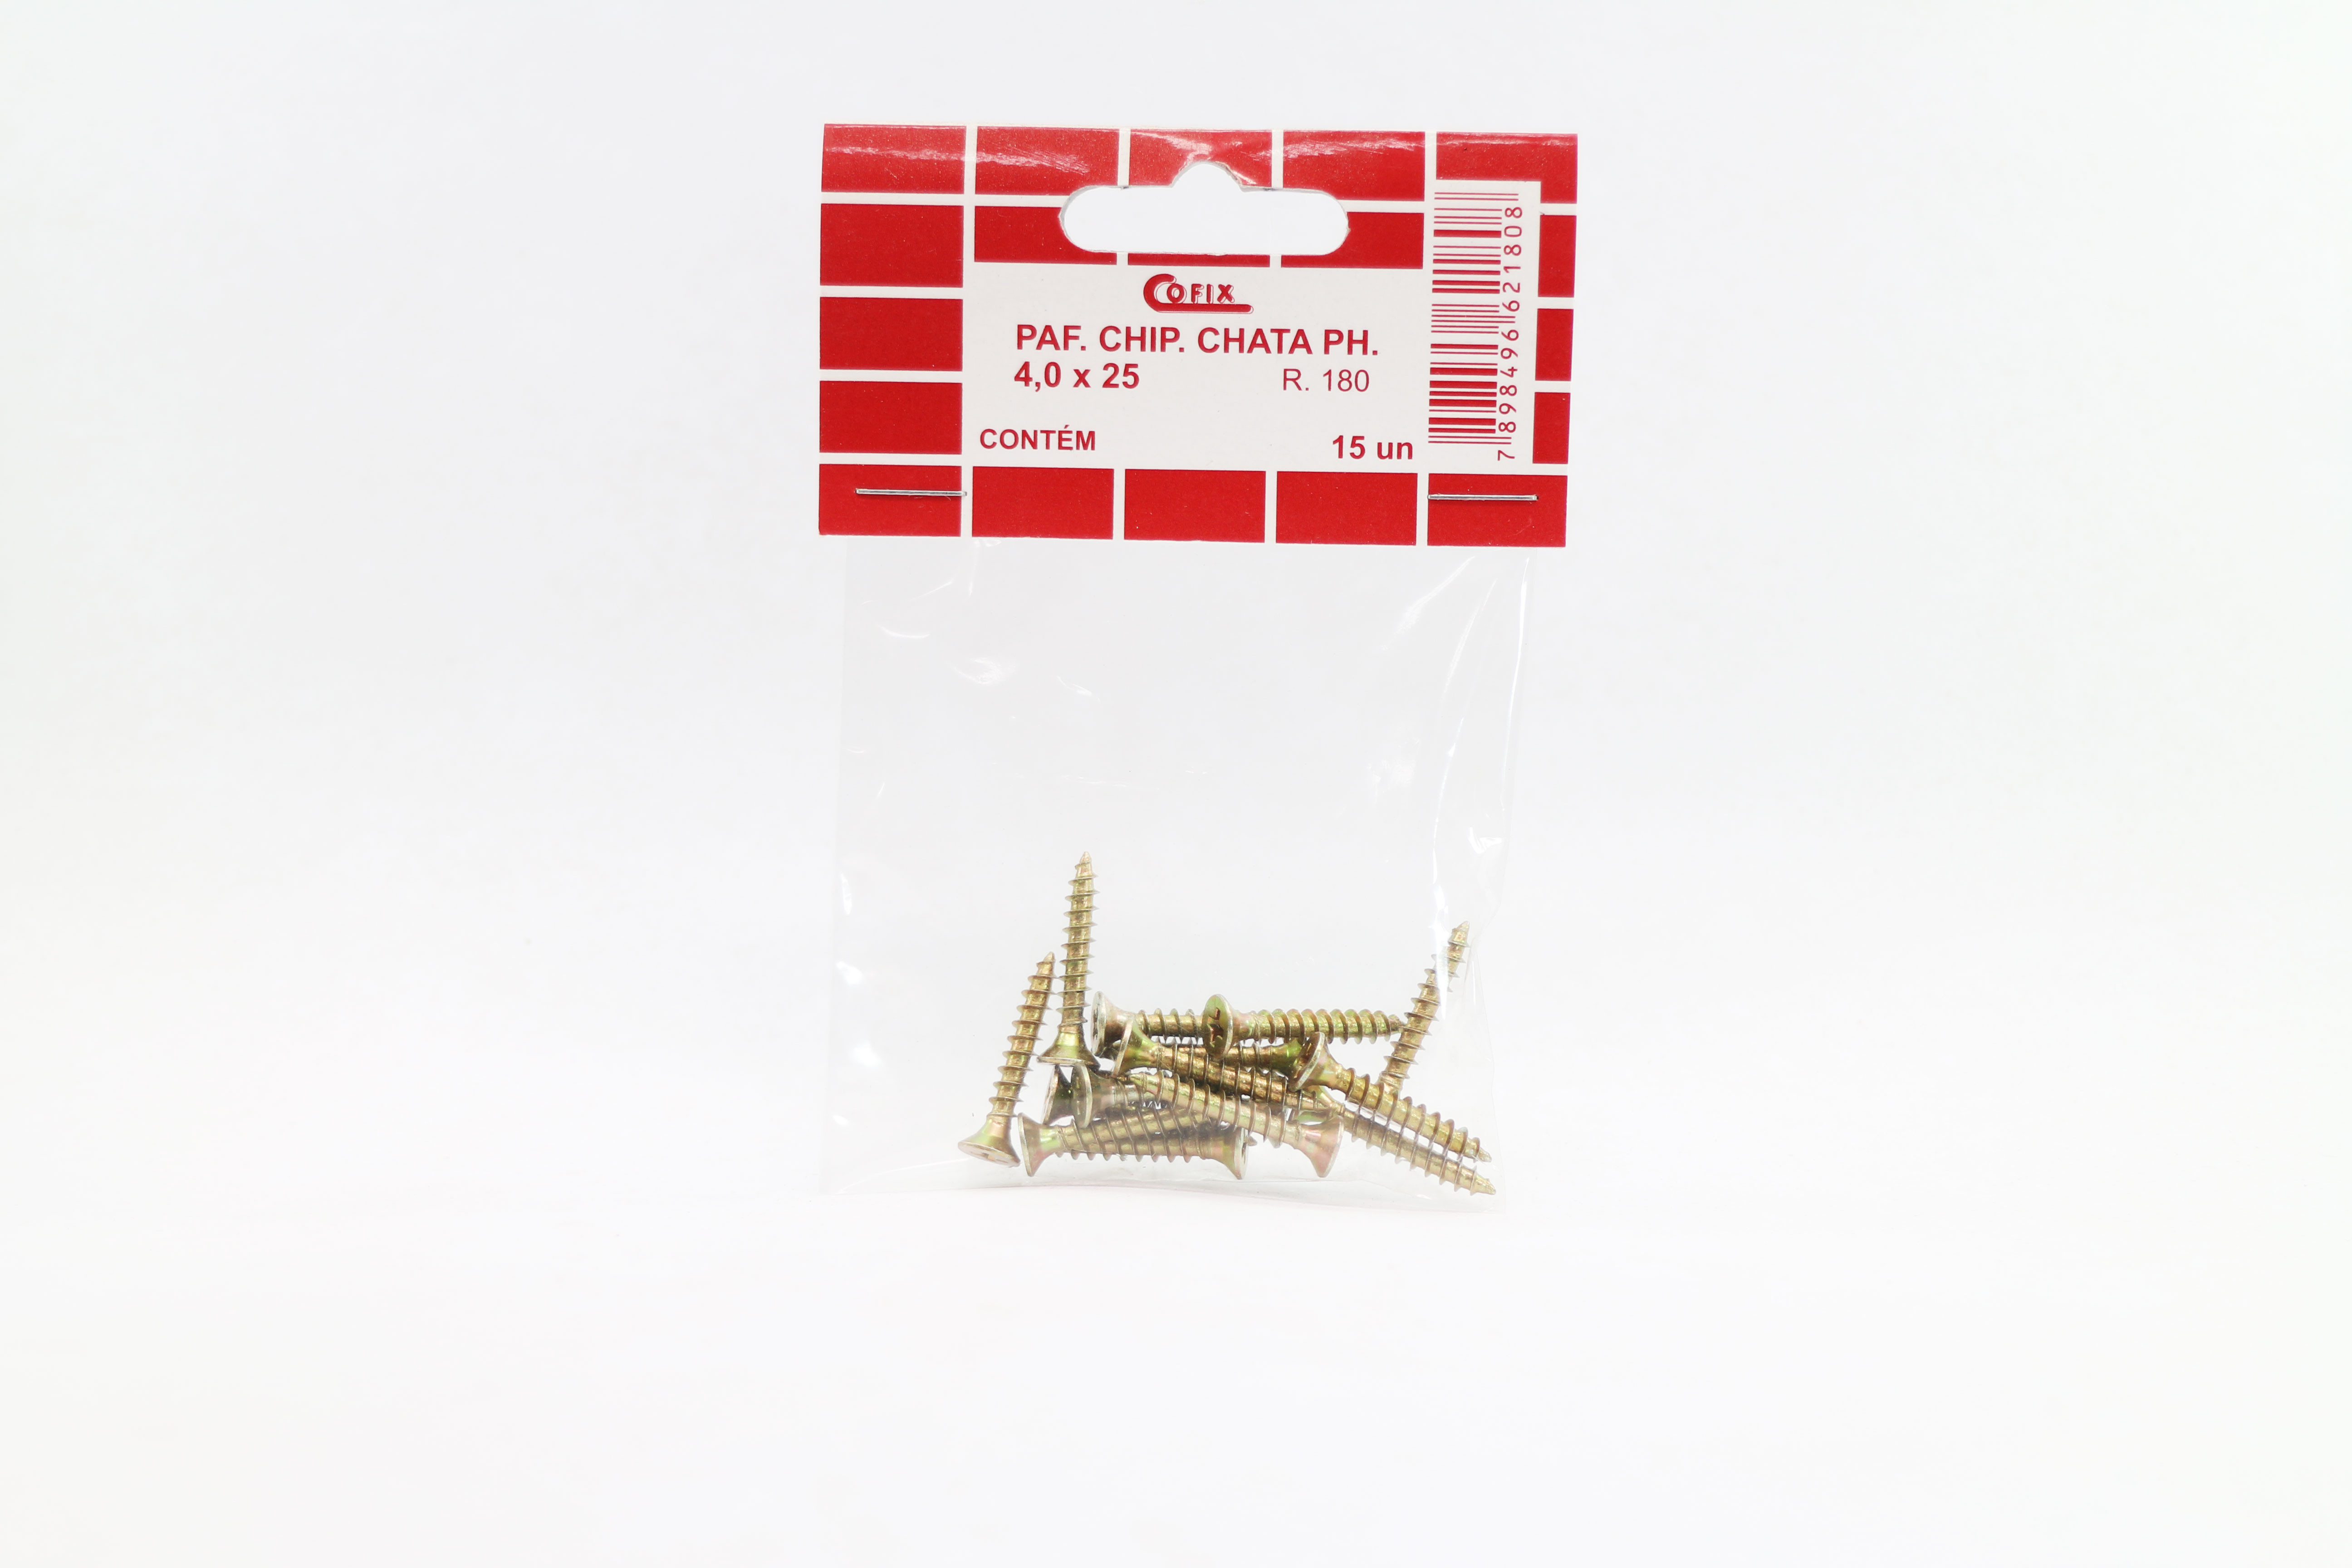 Cartela de Parafuso Chip 4,0x25 15un Cofix